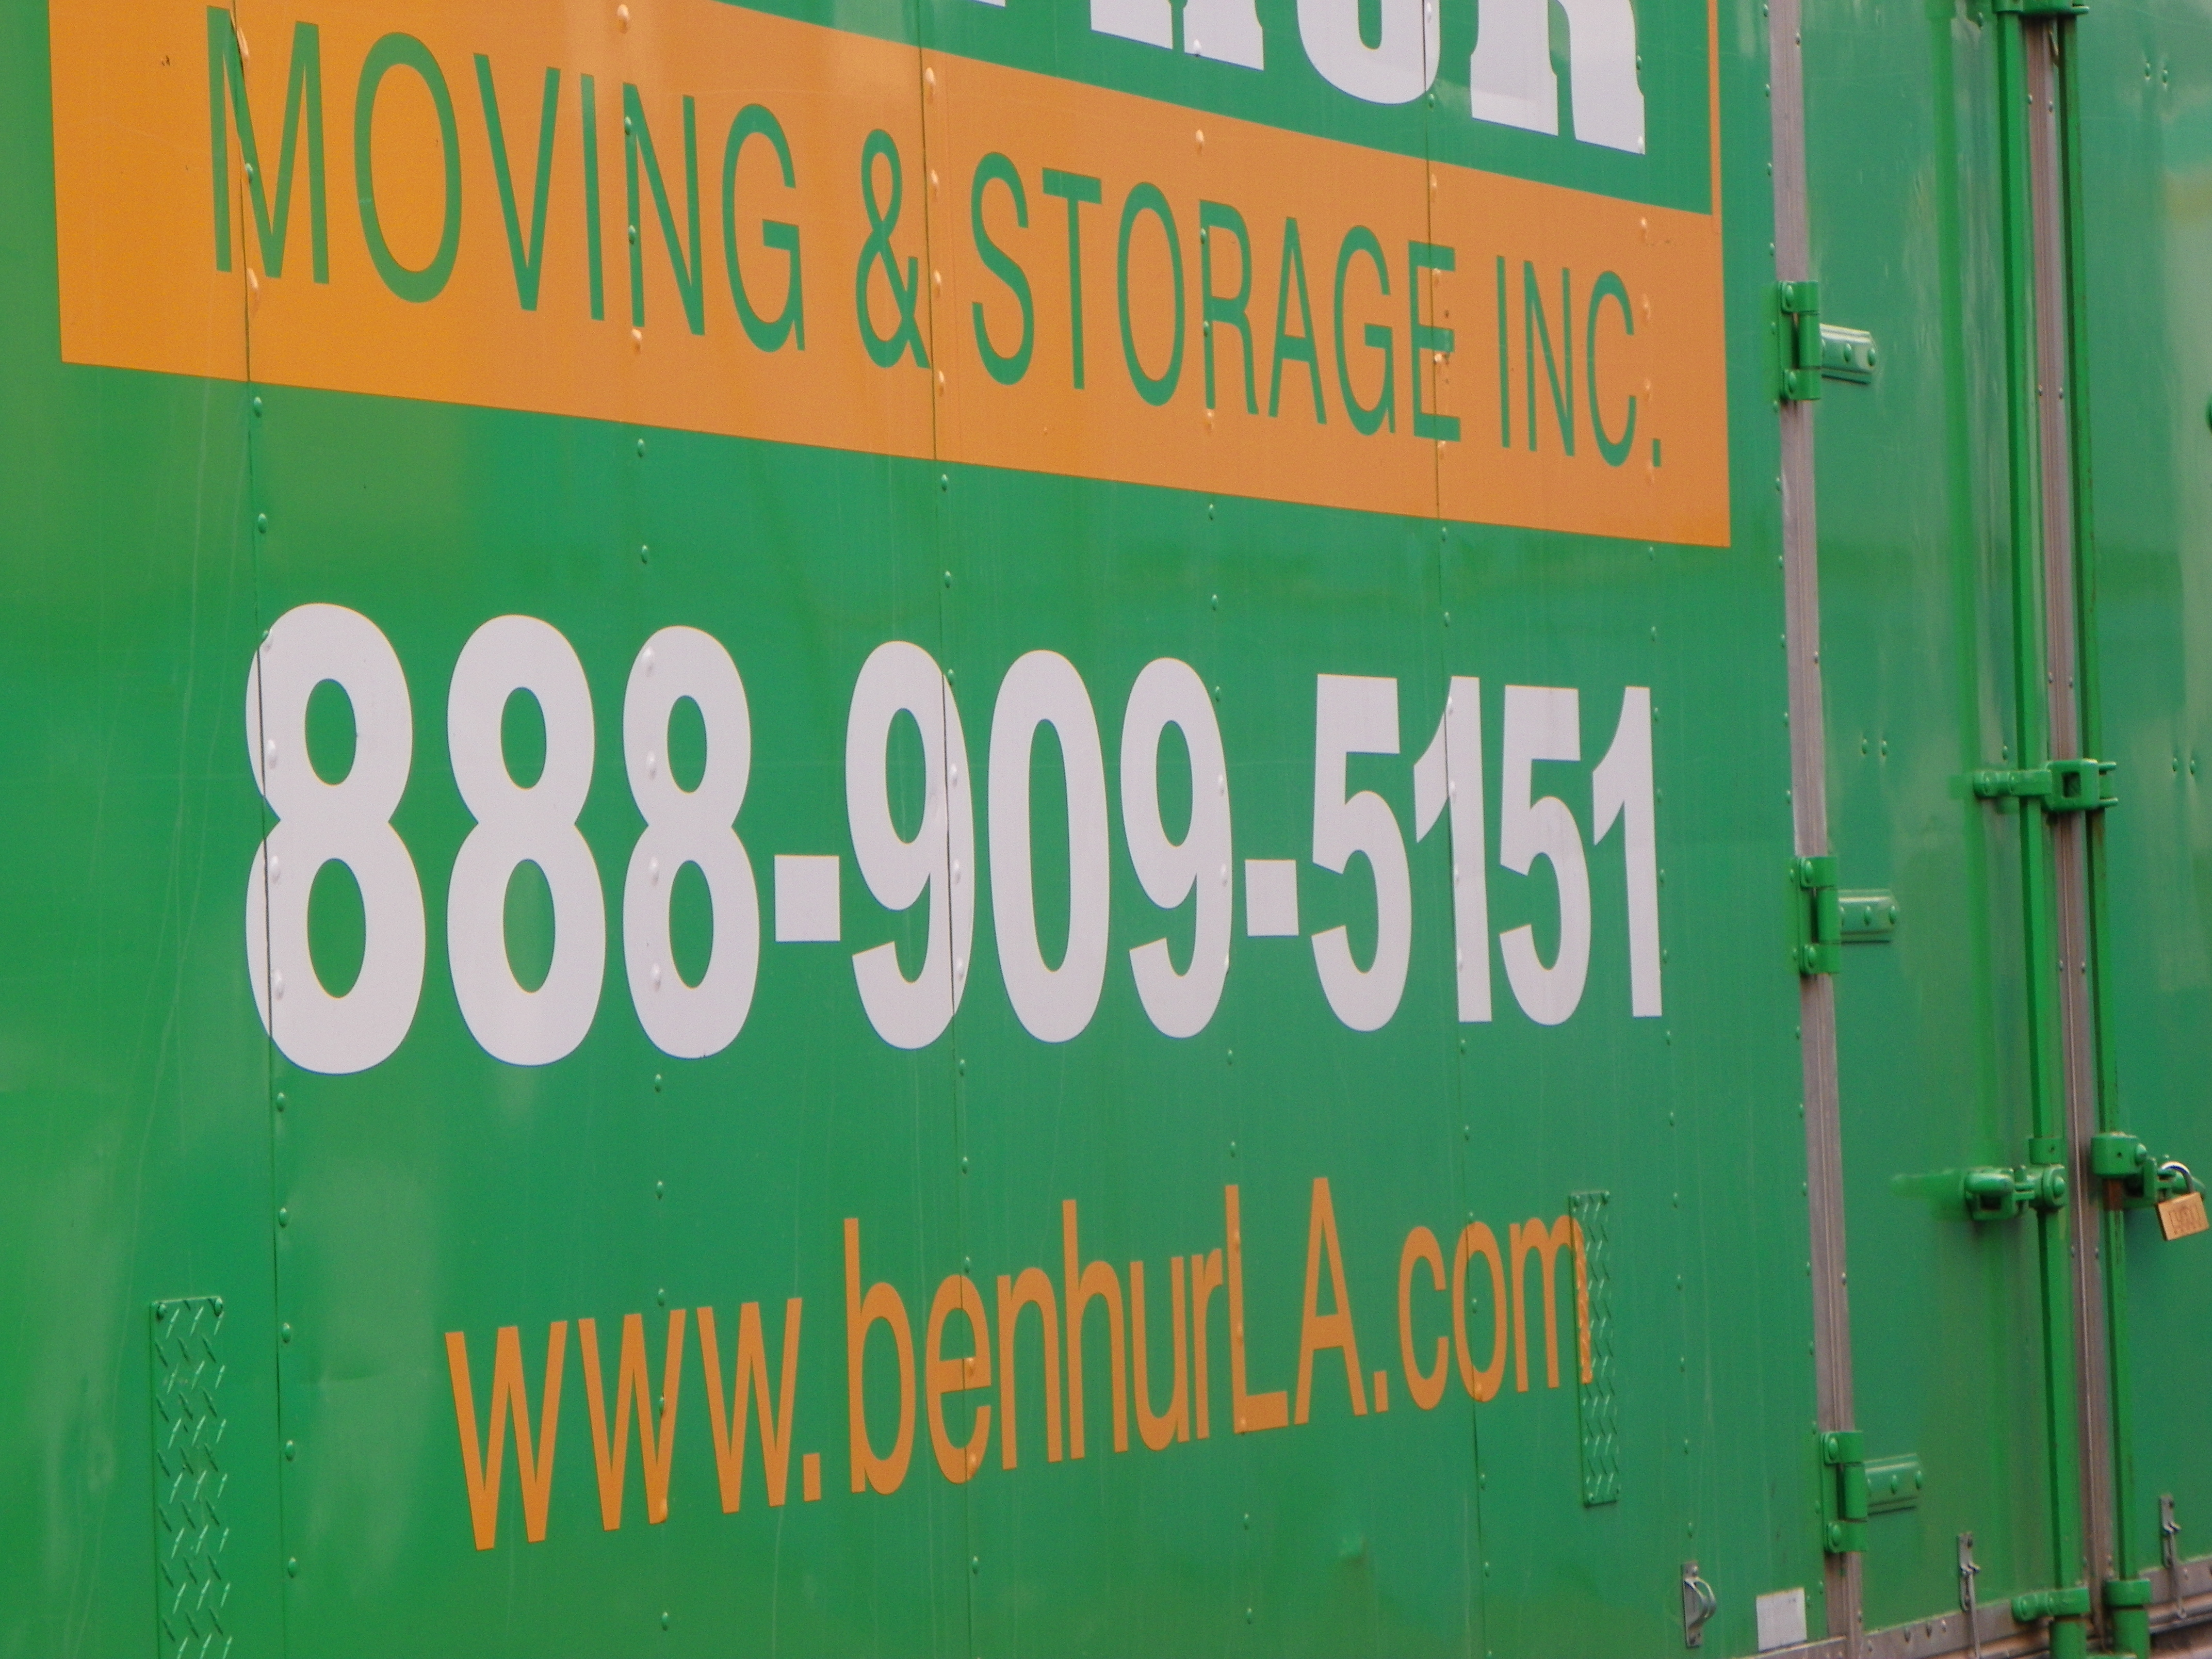 benHur Moving and Storage Inc